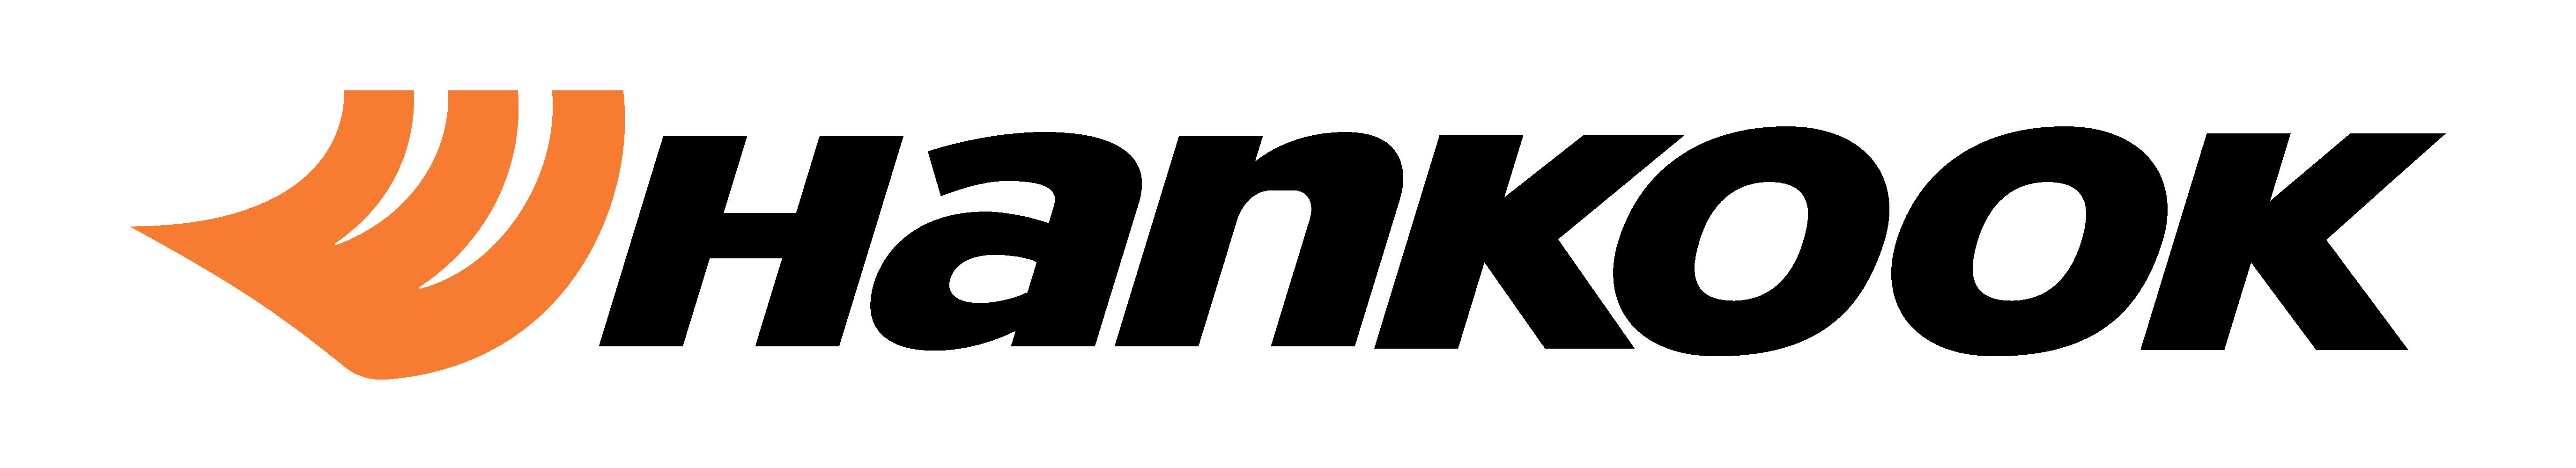 Hankook Tires Logo